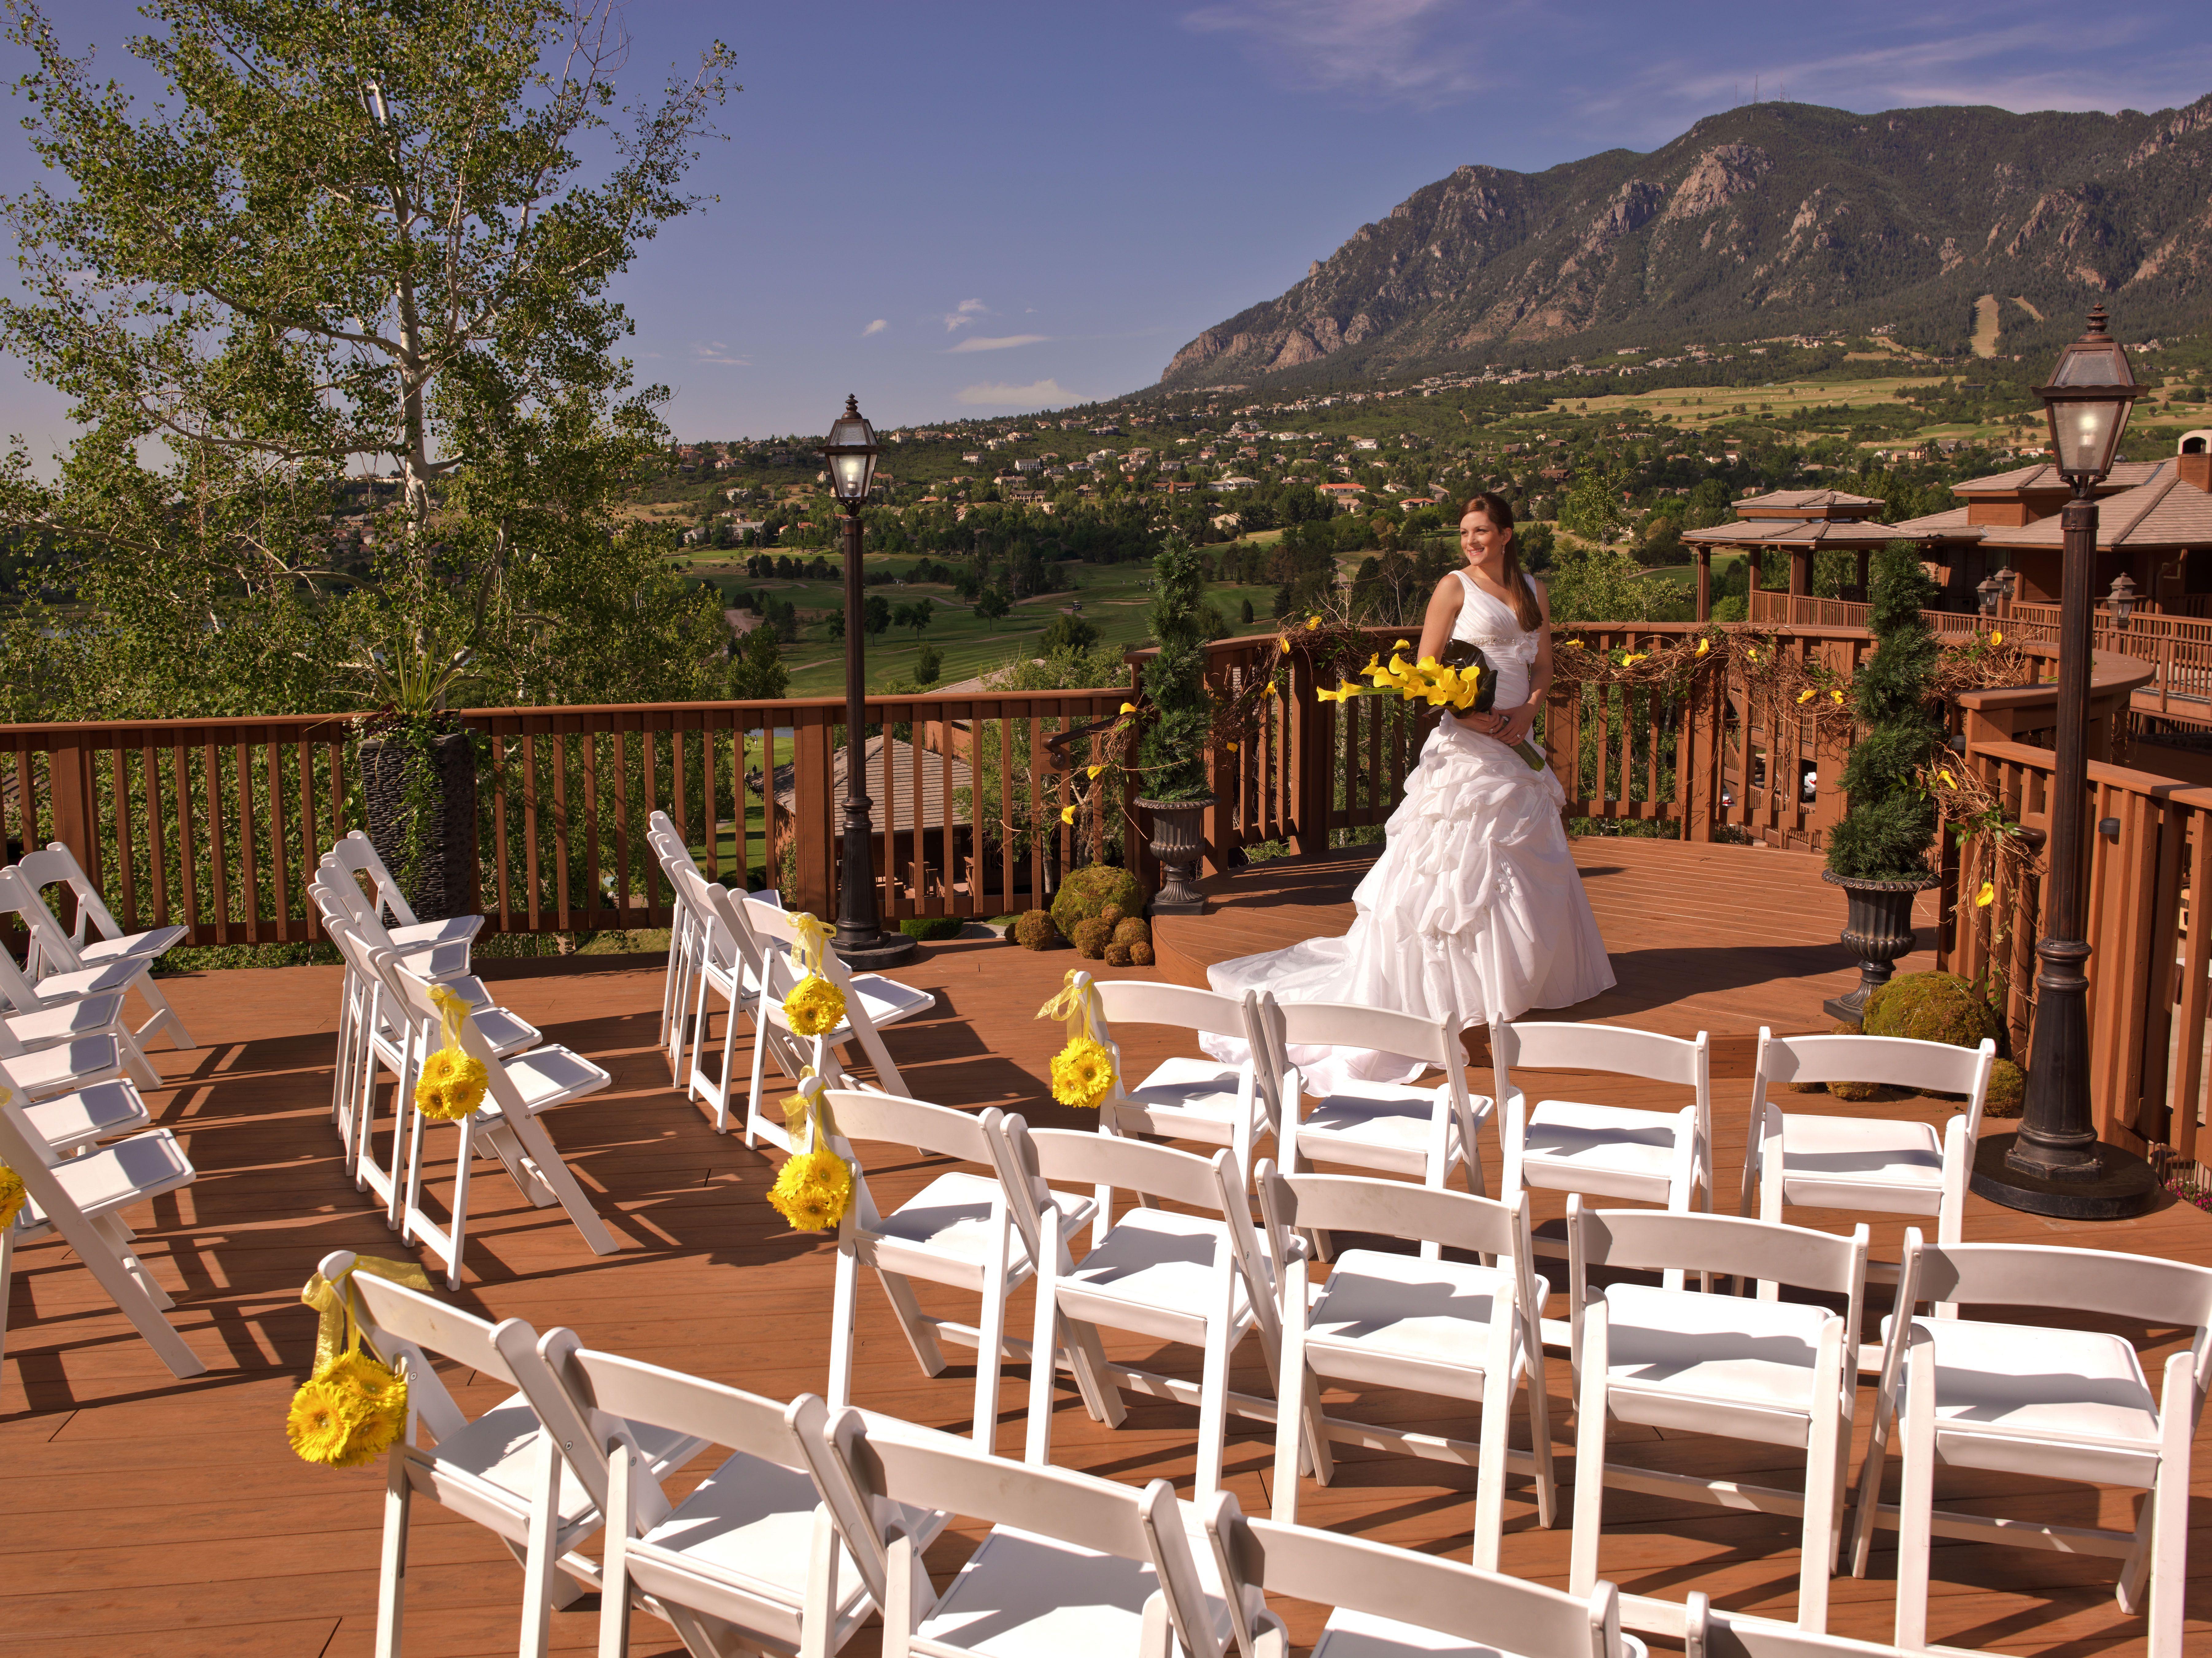 Wedding at Cheyenne Mountain Resort Colorado Springs